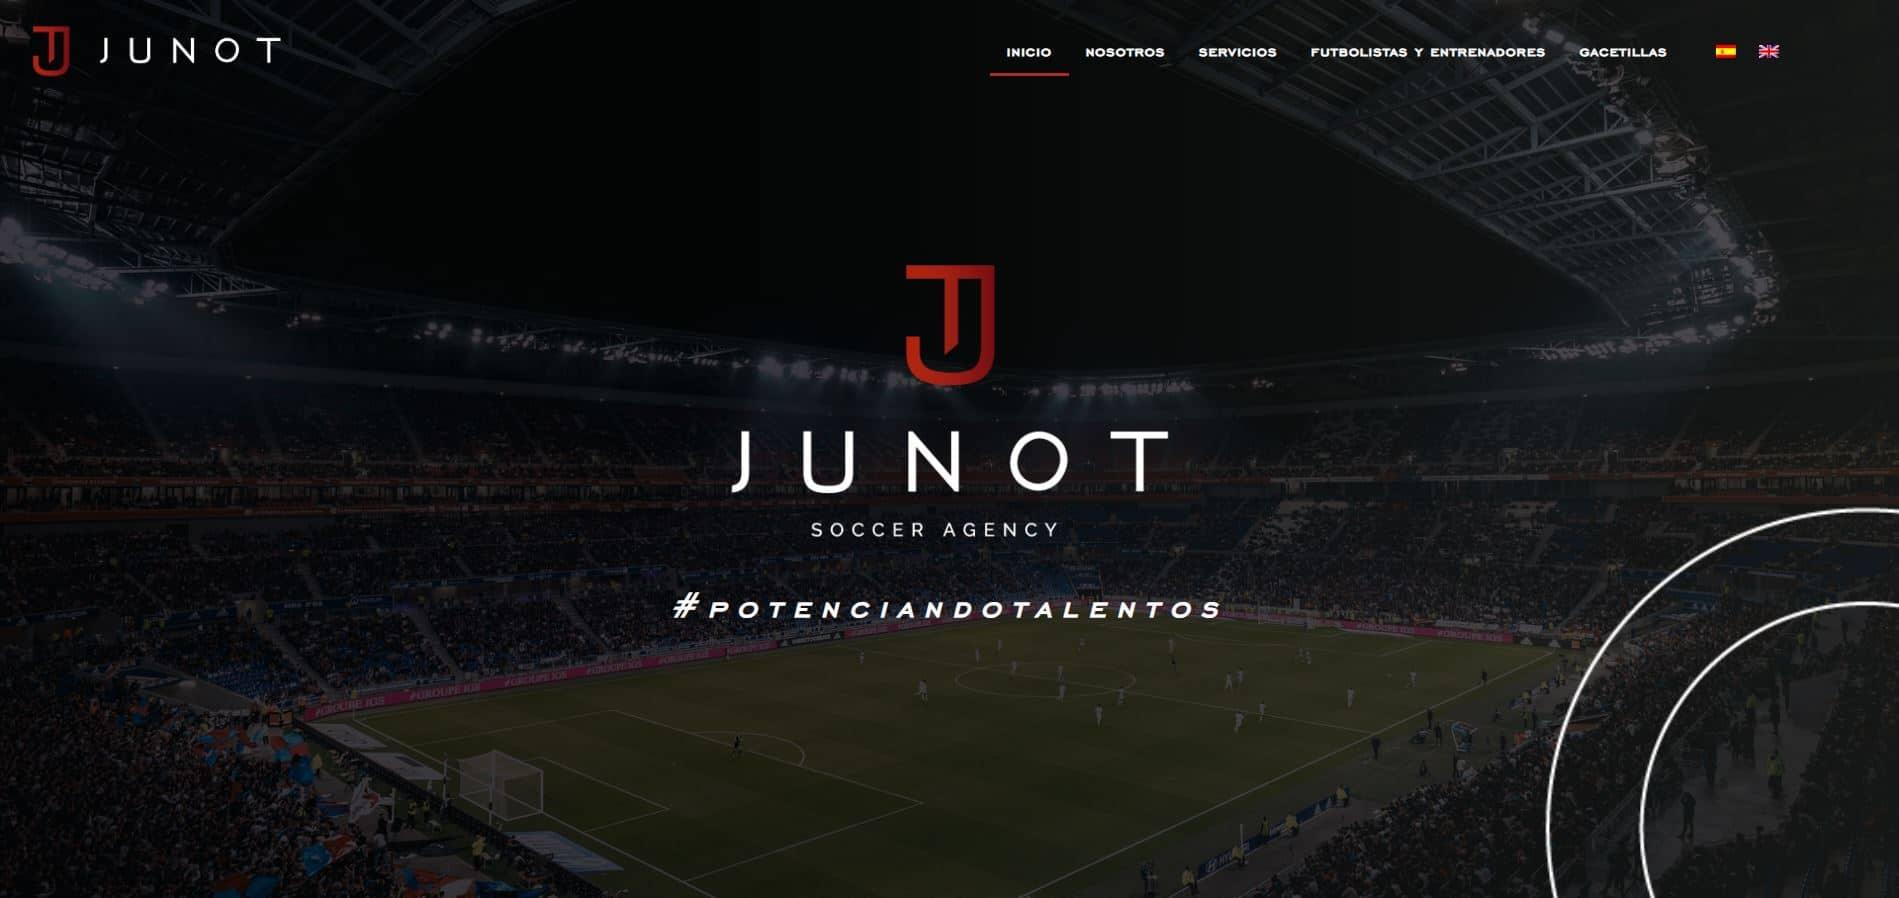 Junot-1-1.jpg